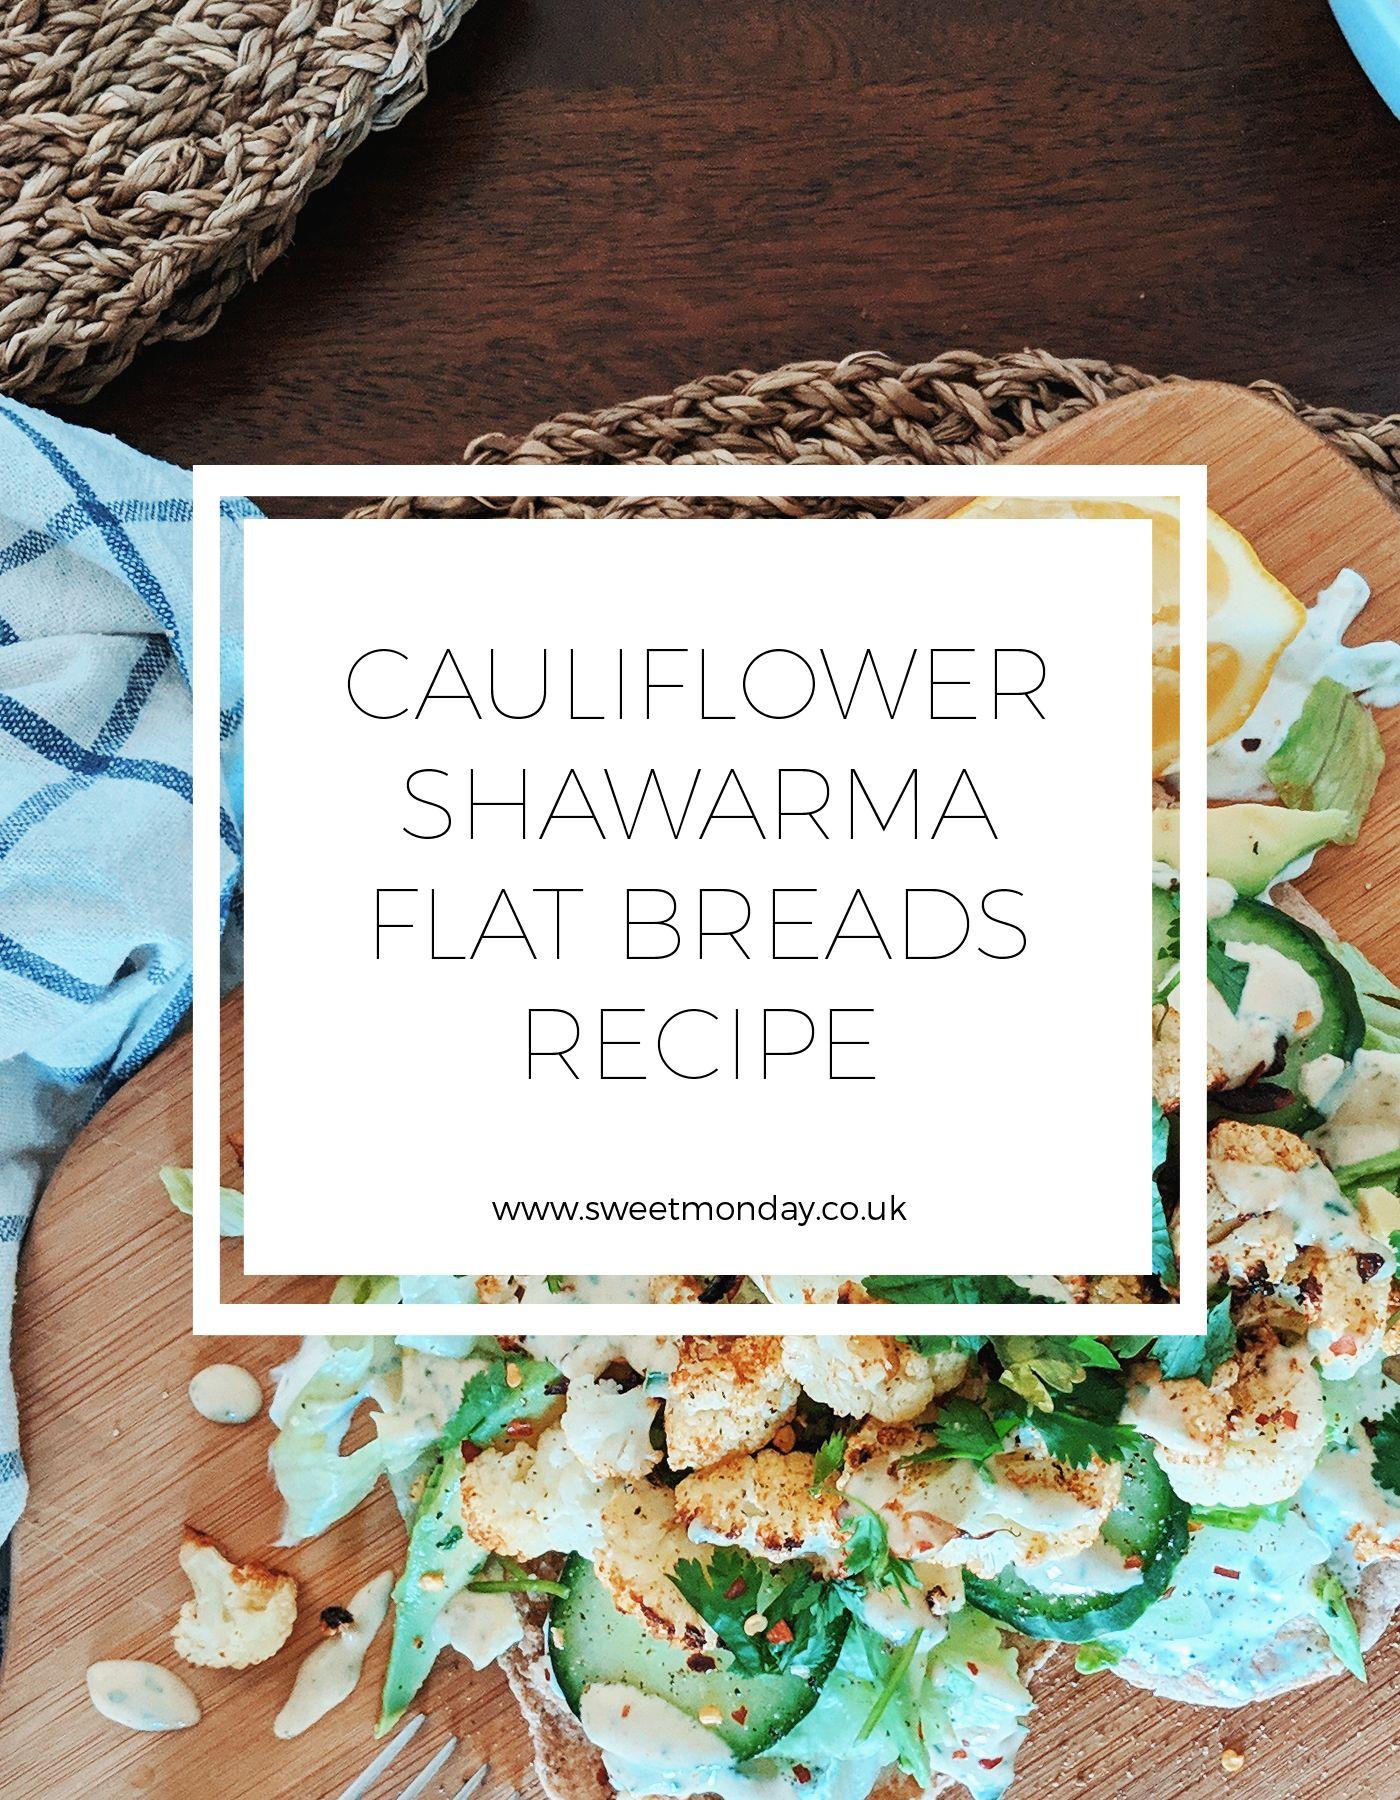 Cauliflower Shawarma Flat Breads Cruise Control In 2019